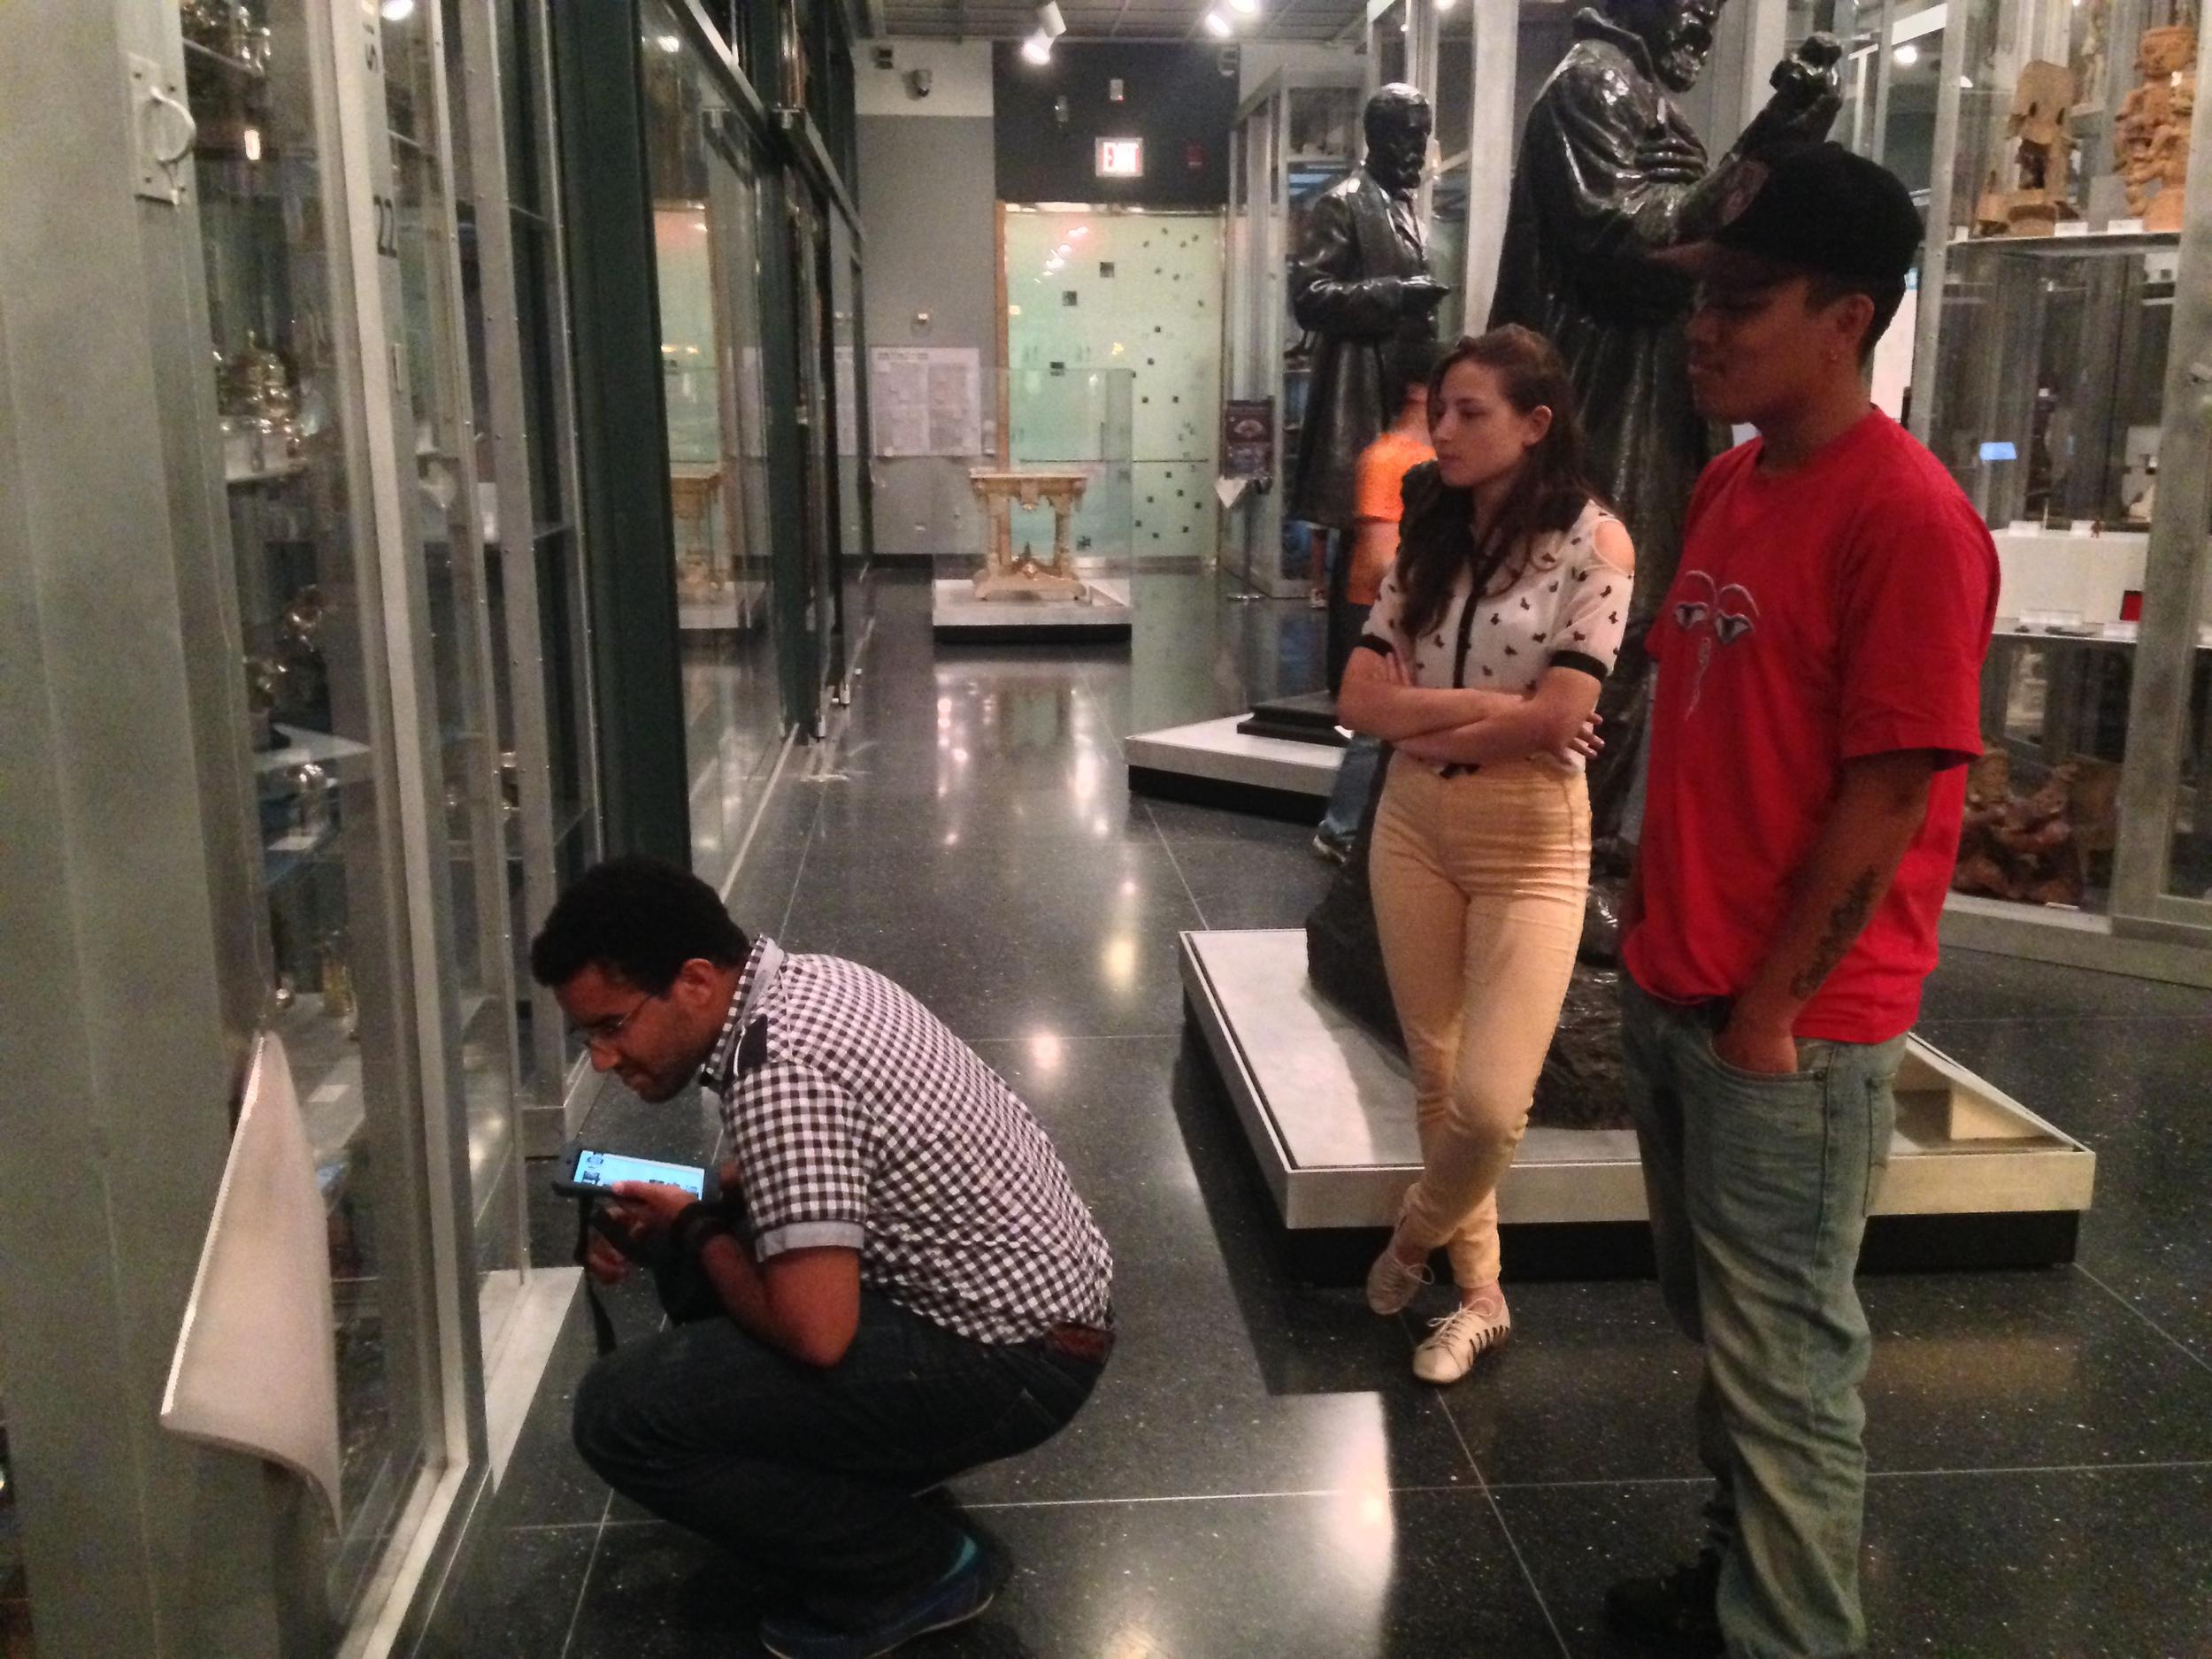 Playtesting with museum staff